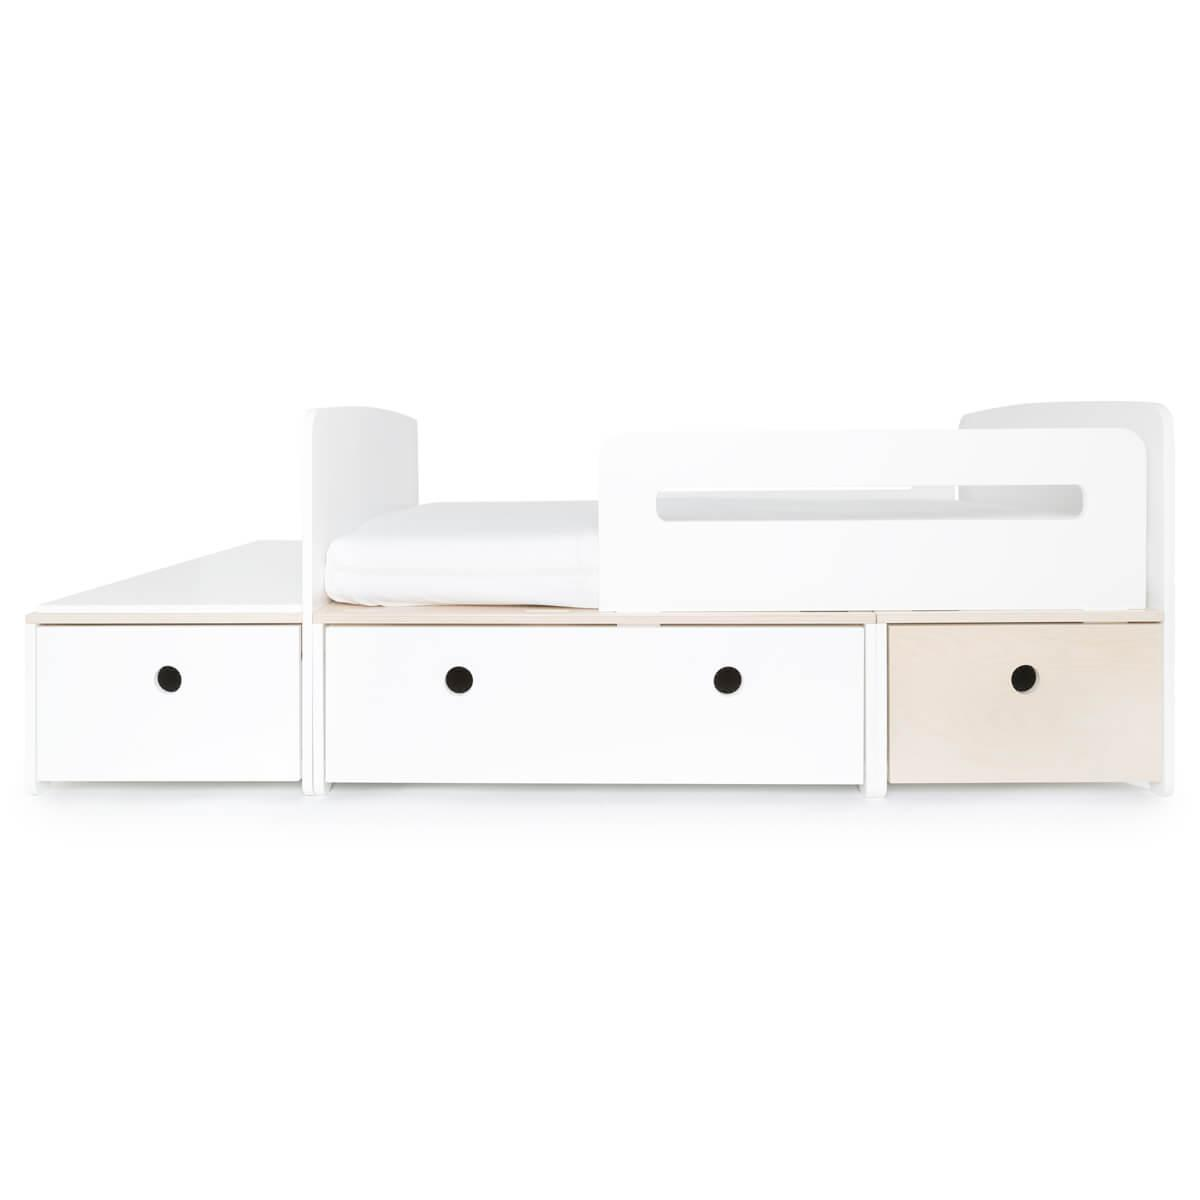 Juniorbett mitwachsend 90x150/200cm COLORFLEX white-white-white wash